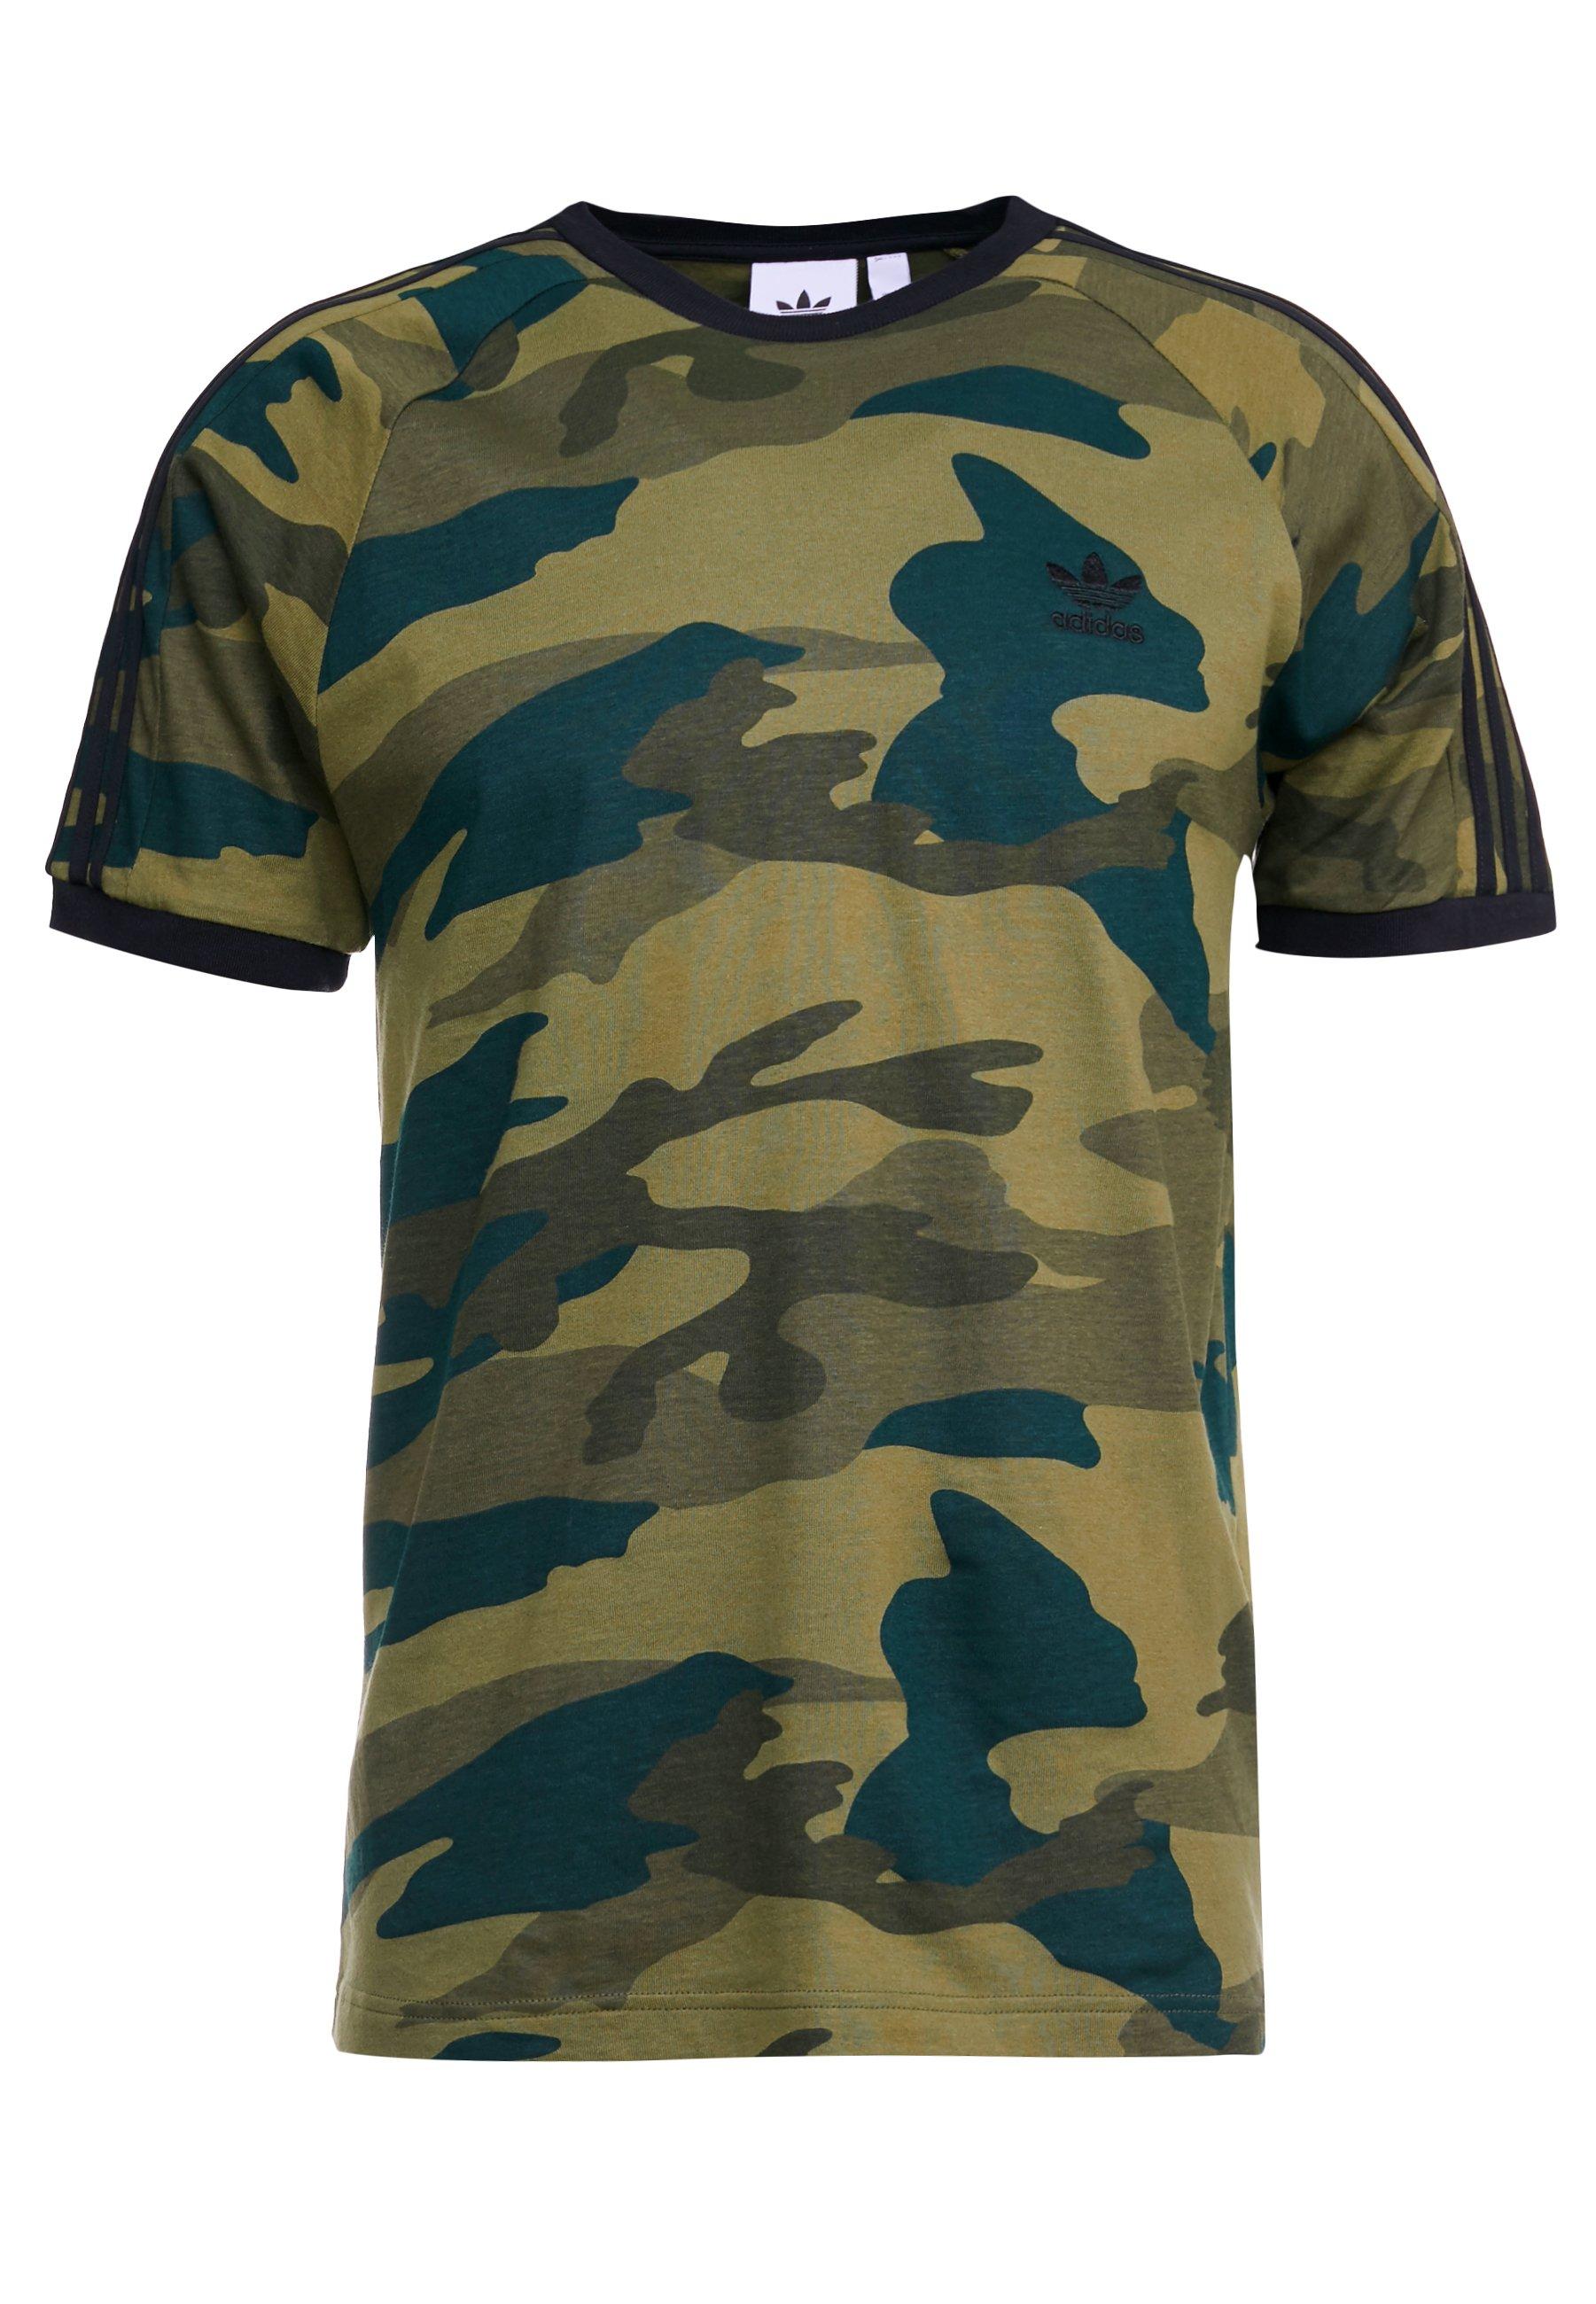 Adidas Originals Camo Cali Short Sleeve Graphic Tee - T-shirt Z Nadrukiem Multicolor